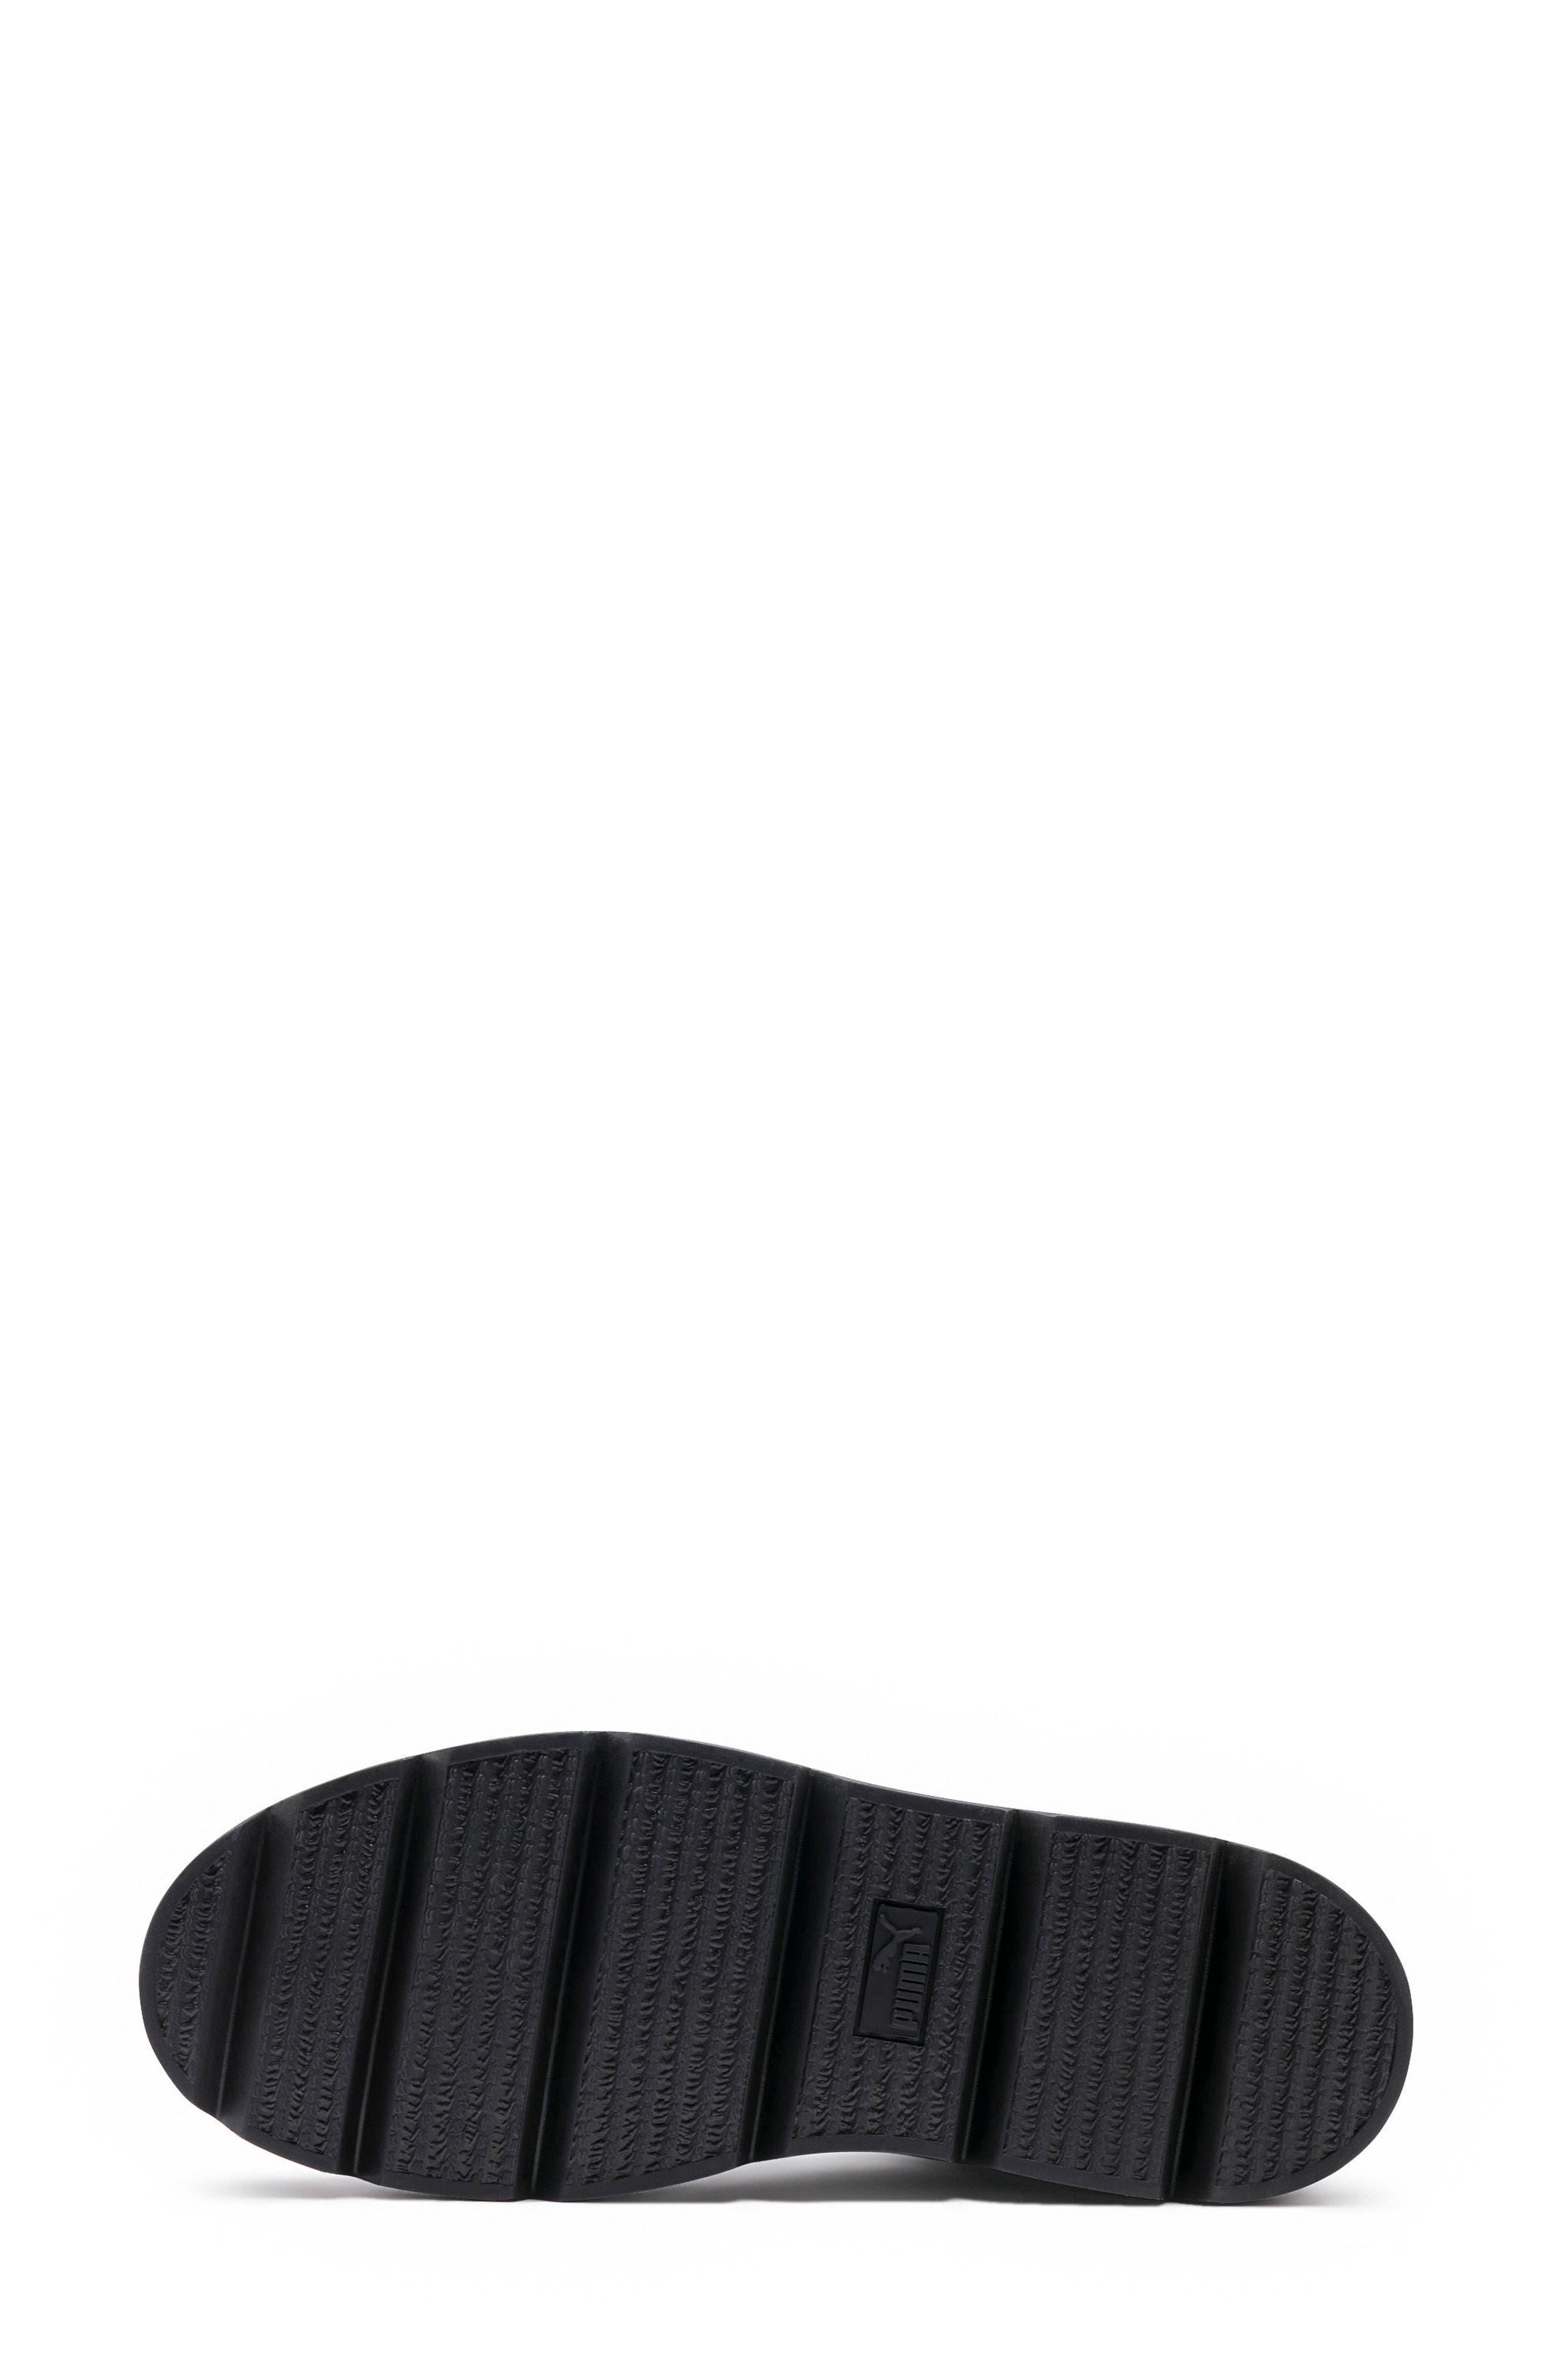 FENTY PUMA by Rihanna Chelsea Boot Creeper Sneaker,                             Alternate thumbnail 10, color,